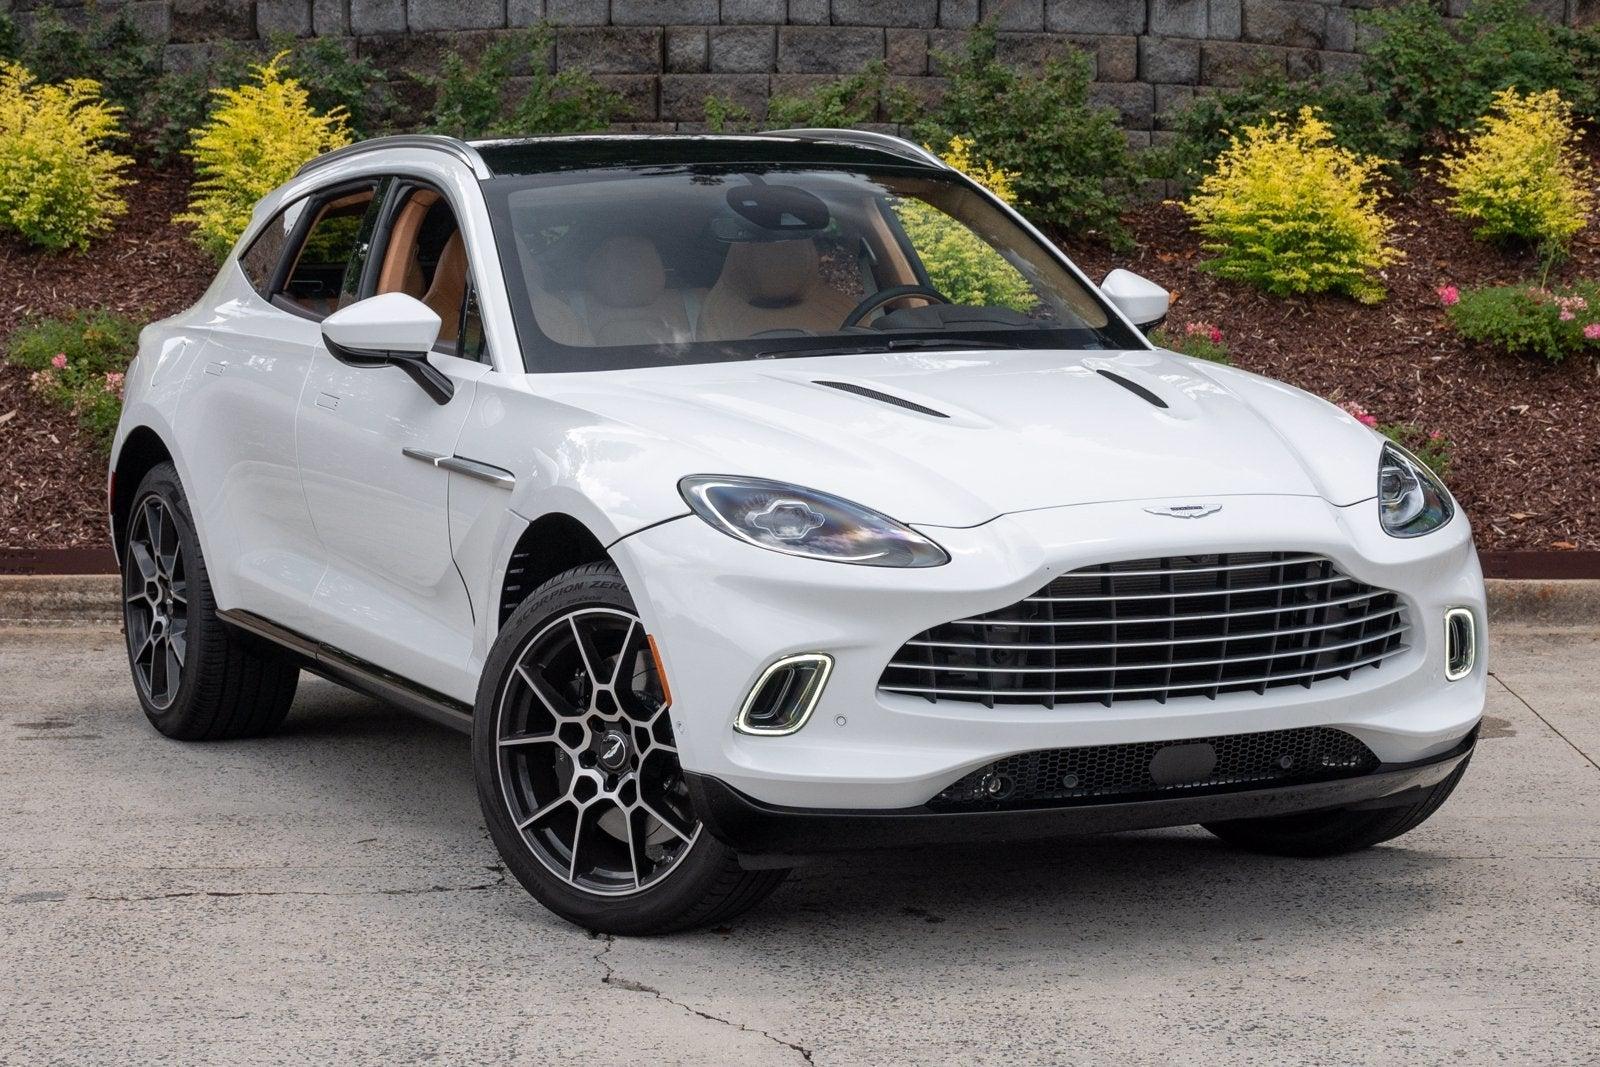 2021 Aston Martin Dbx Awd Charlotte Nc Cornelius Davidson Huntersville North Carolina Scfvujaw9mtv00585